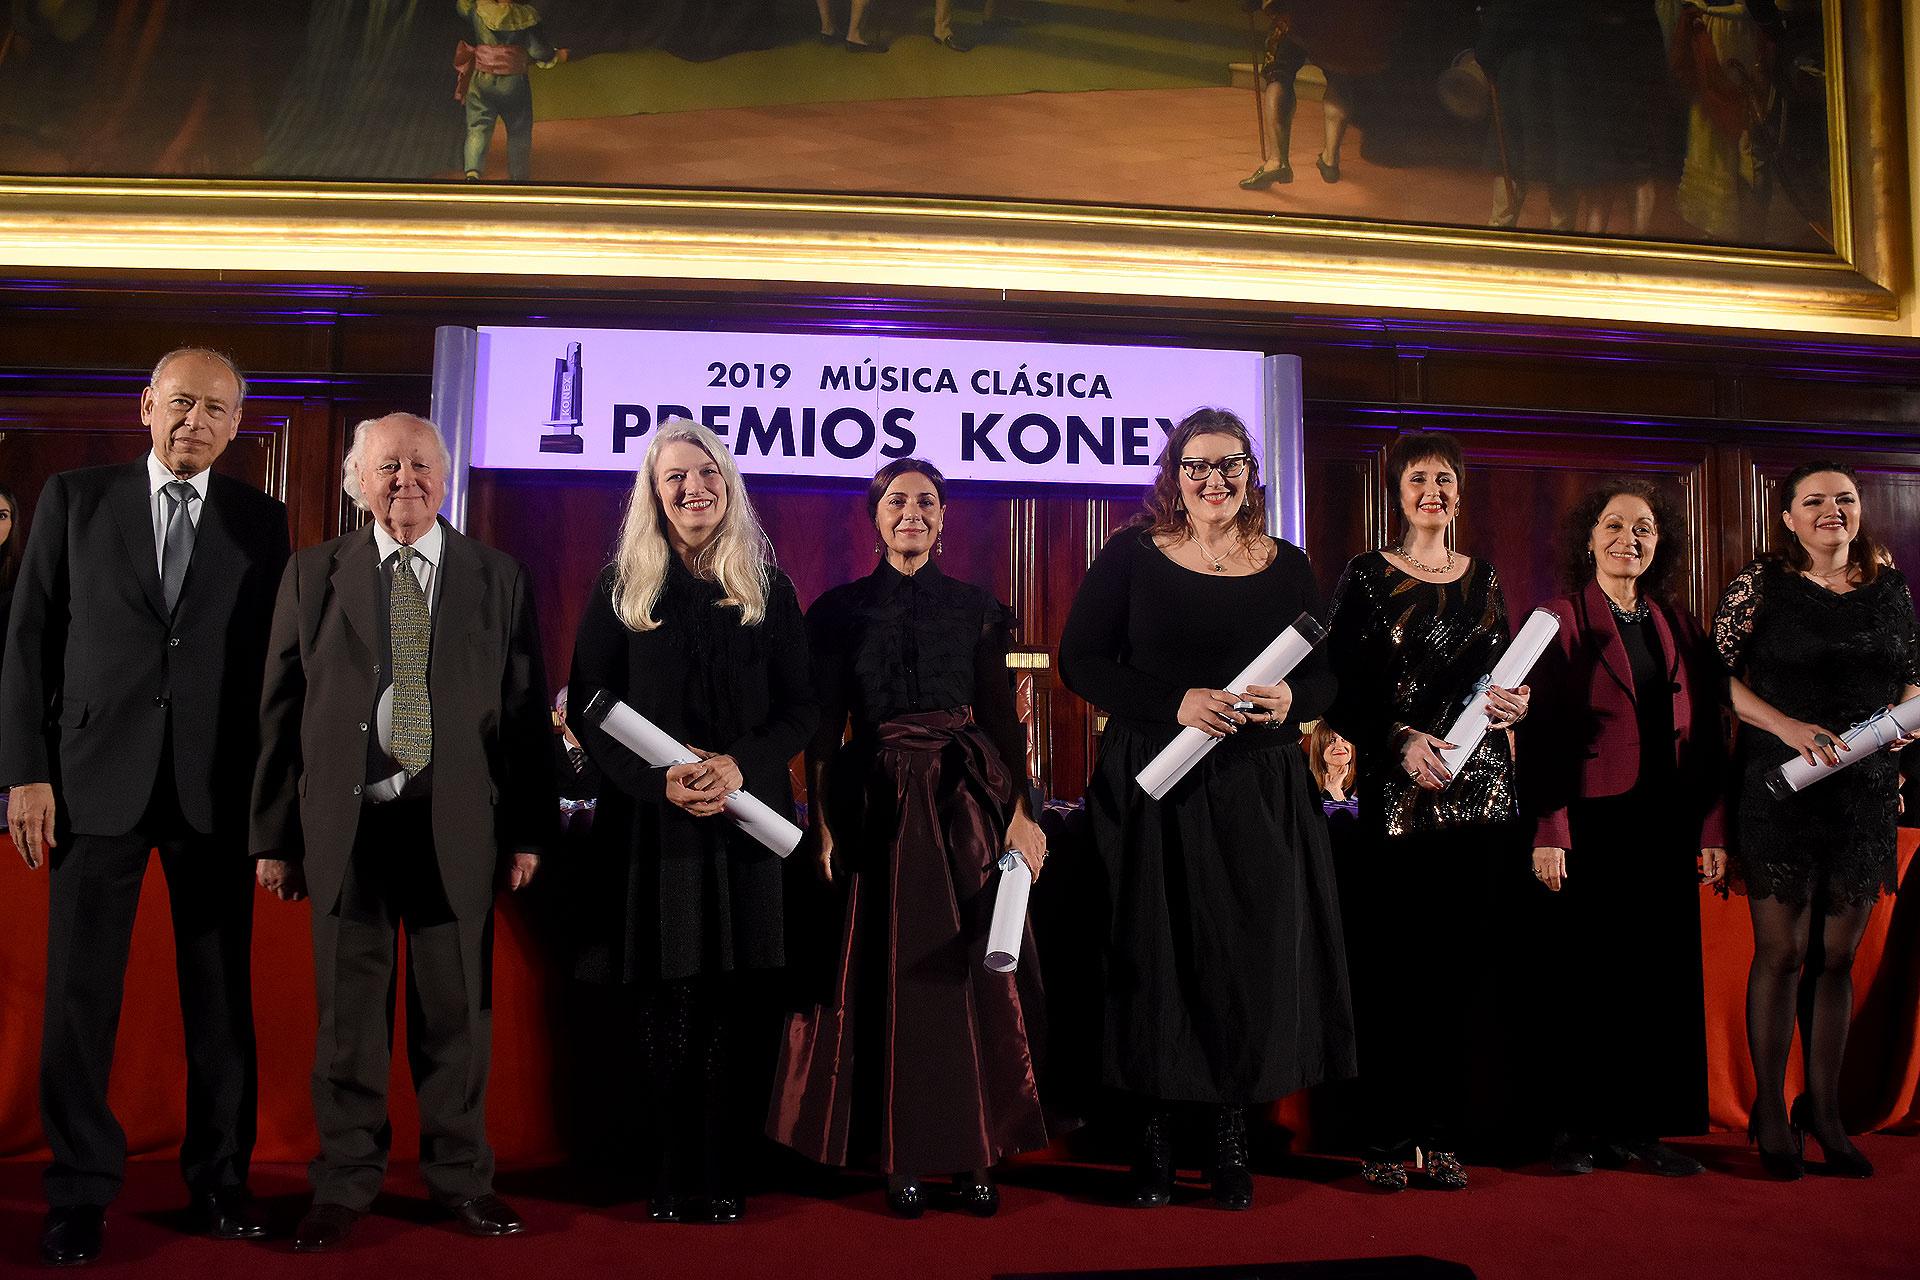 En la disciplina de cantante femenina, Veronica Cangemi, Mónica Ferracani, Carla Flipcic Holm, María Cristina Kiehr y Daniela Tabernig